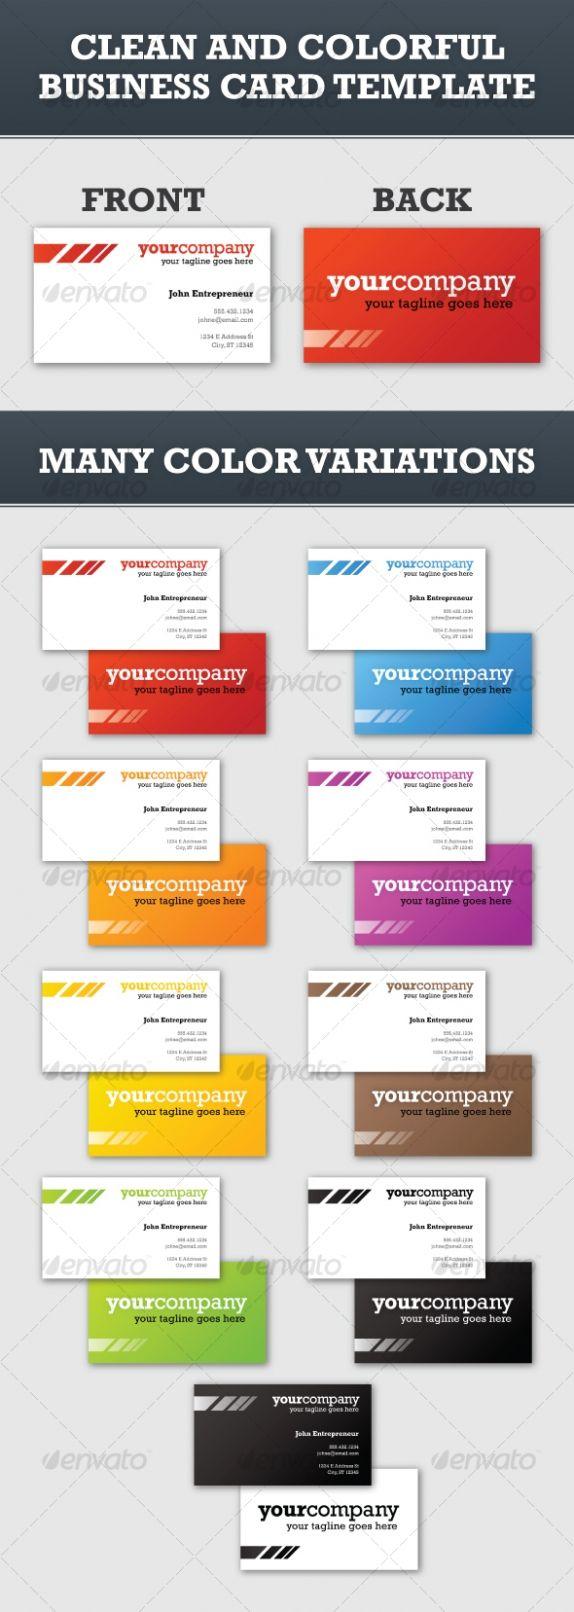 business card design templates  cardview  business